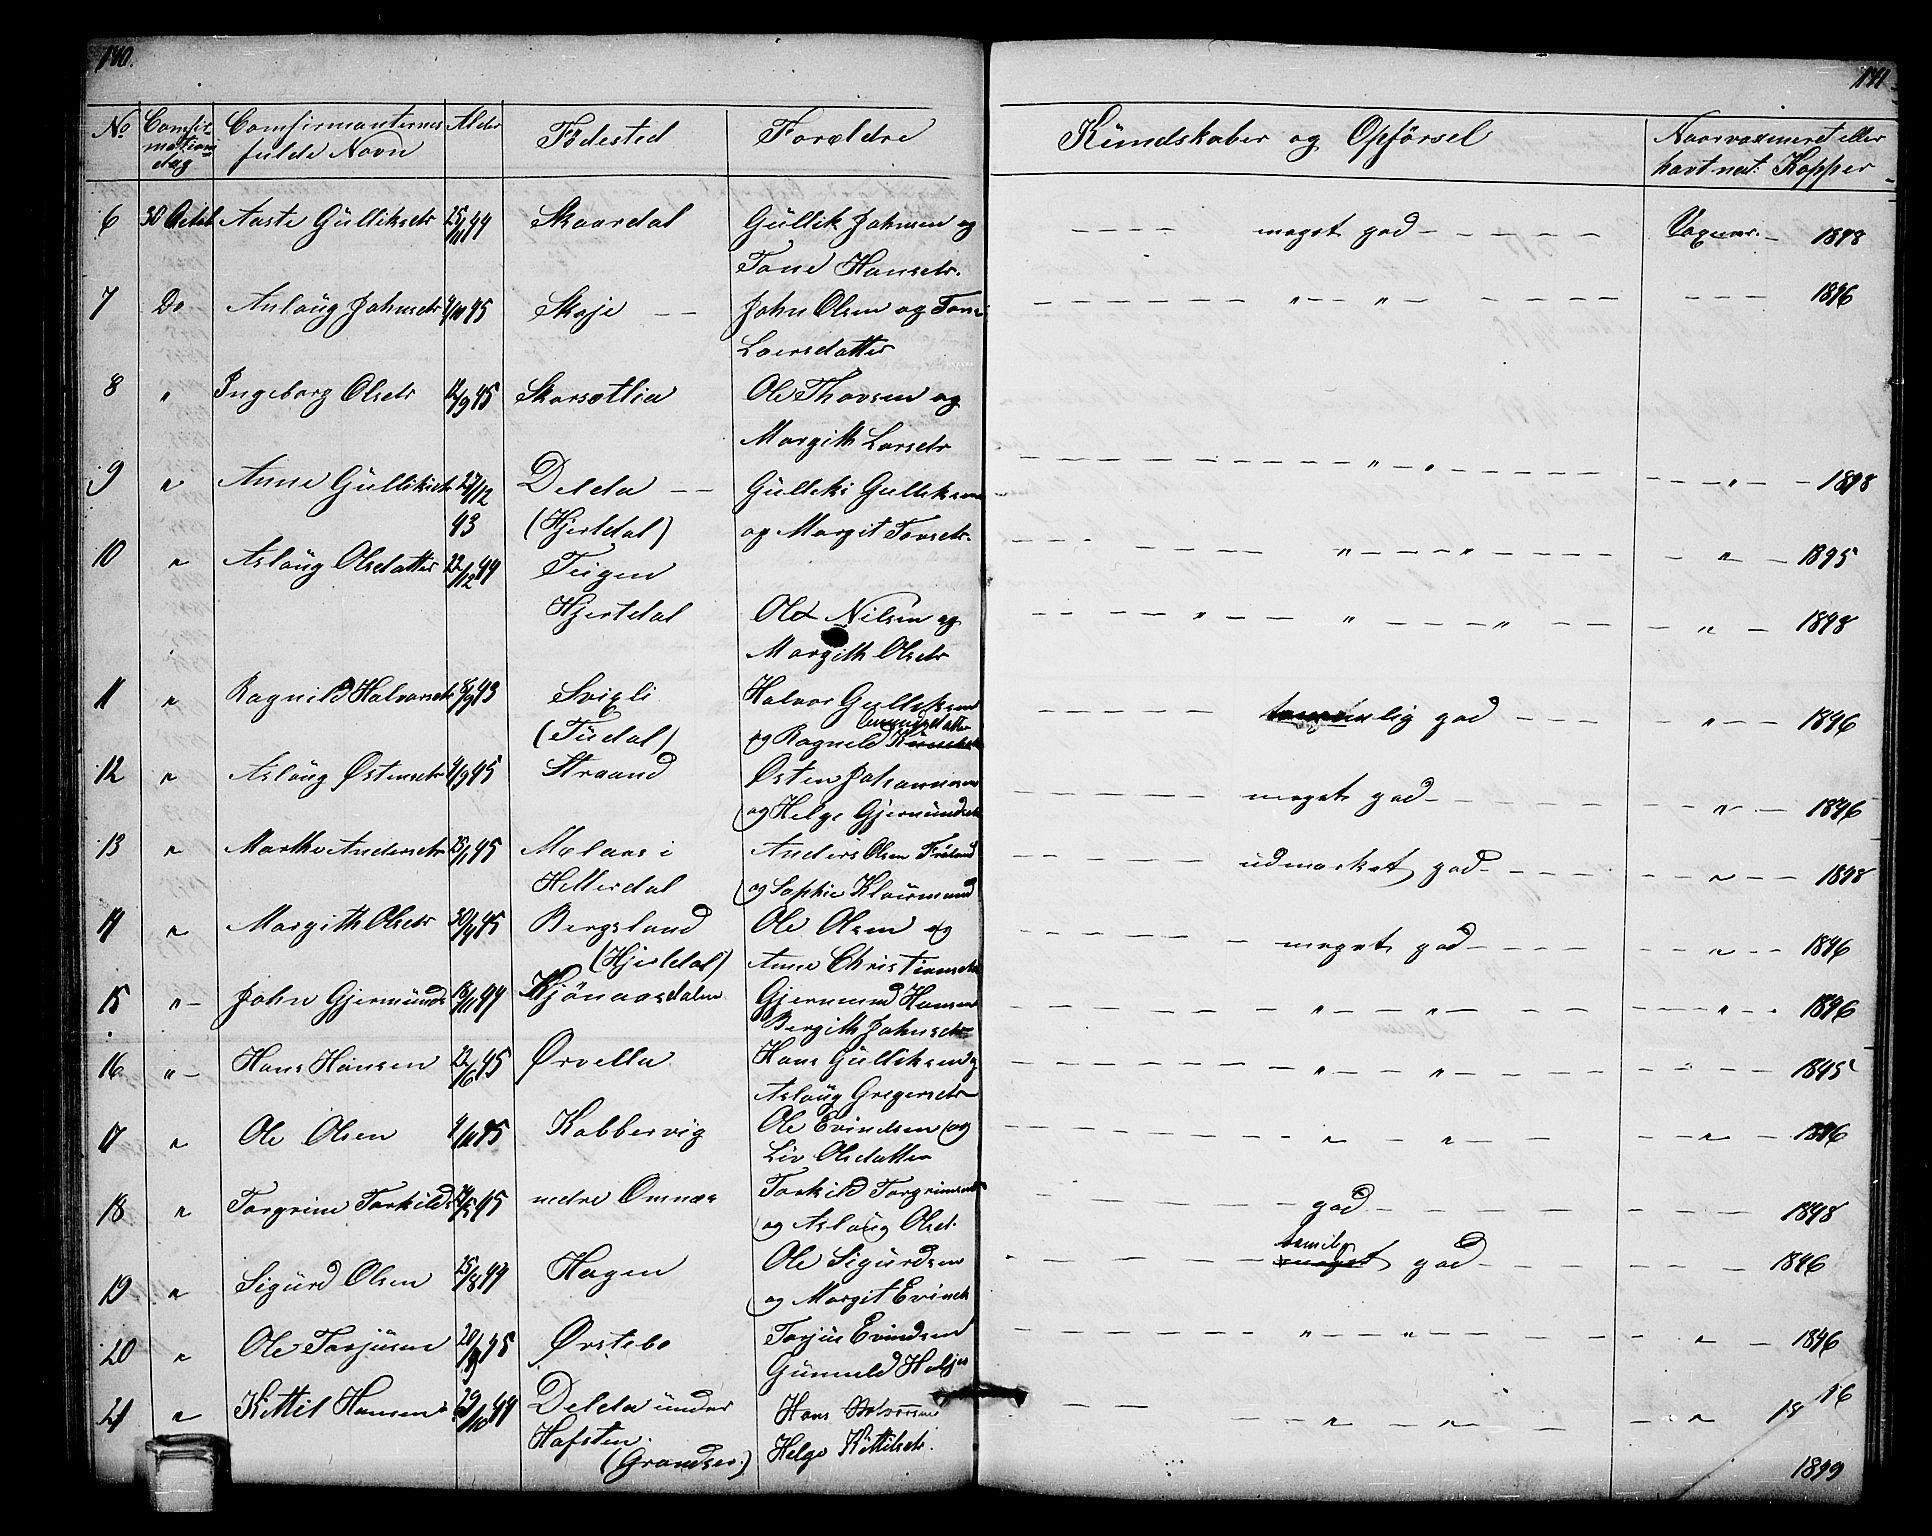 SAKO, Hjartdal kirkebøker, G/Gb/L0002: Klokkerbok nr. II 2, 1854-1884, s. 140-141